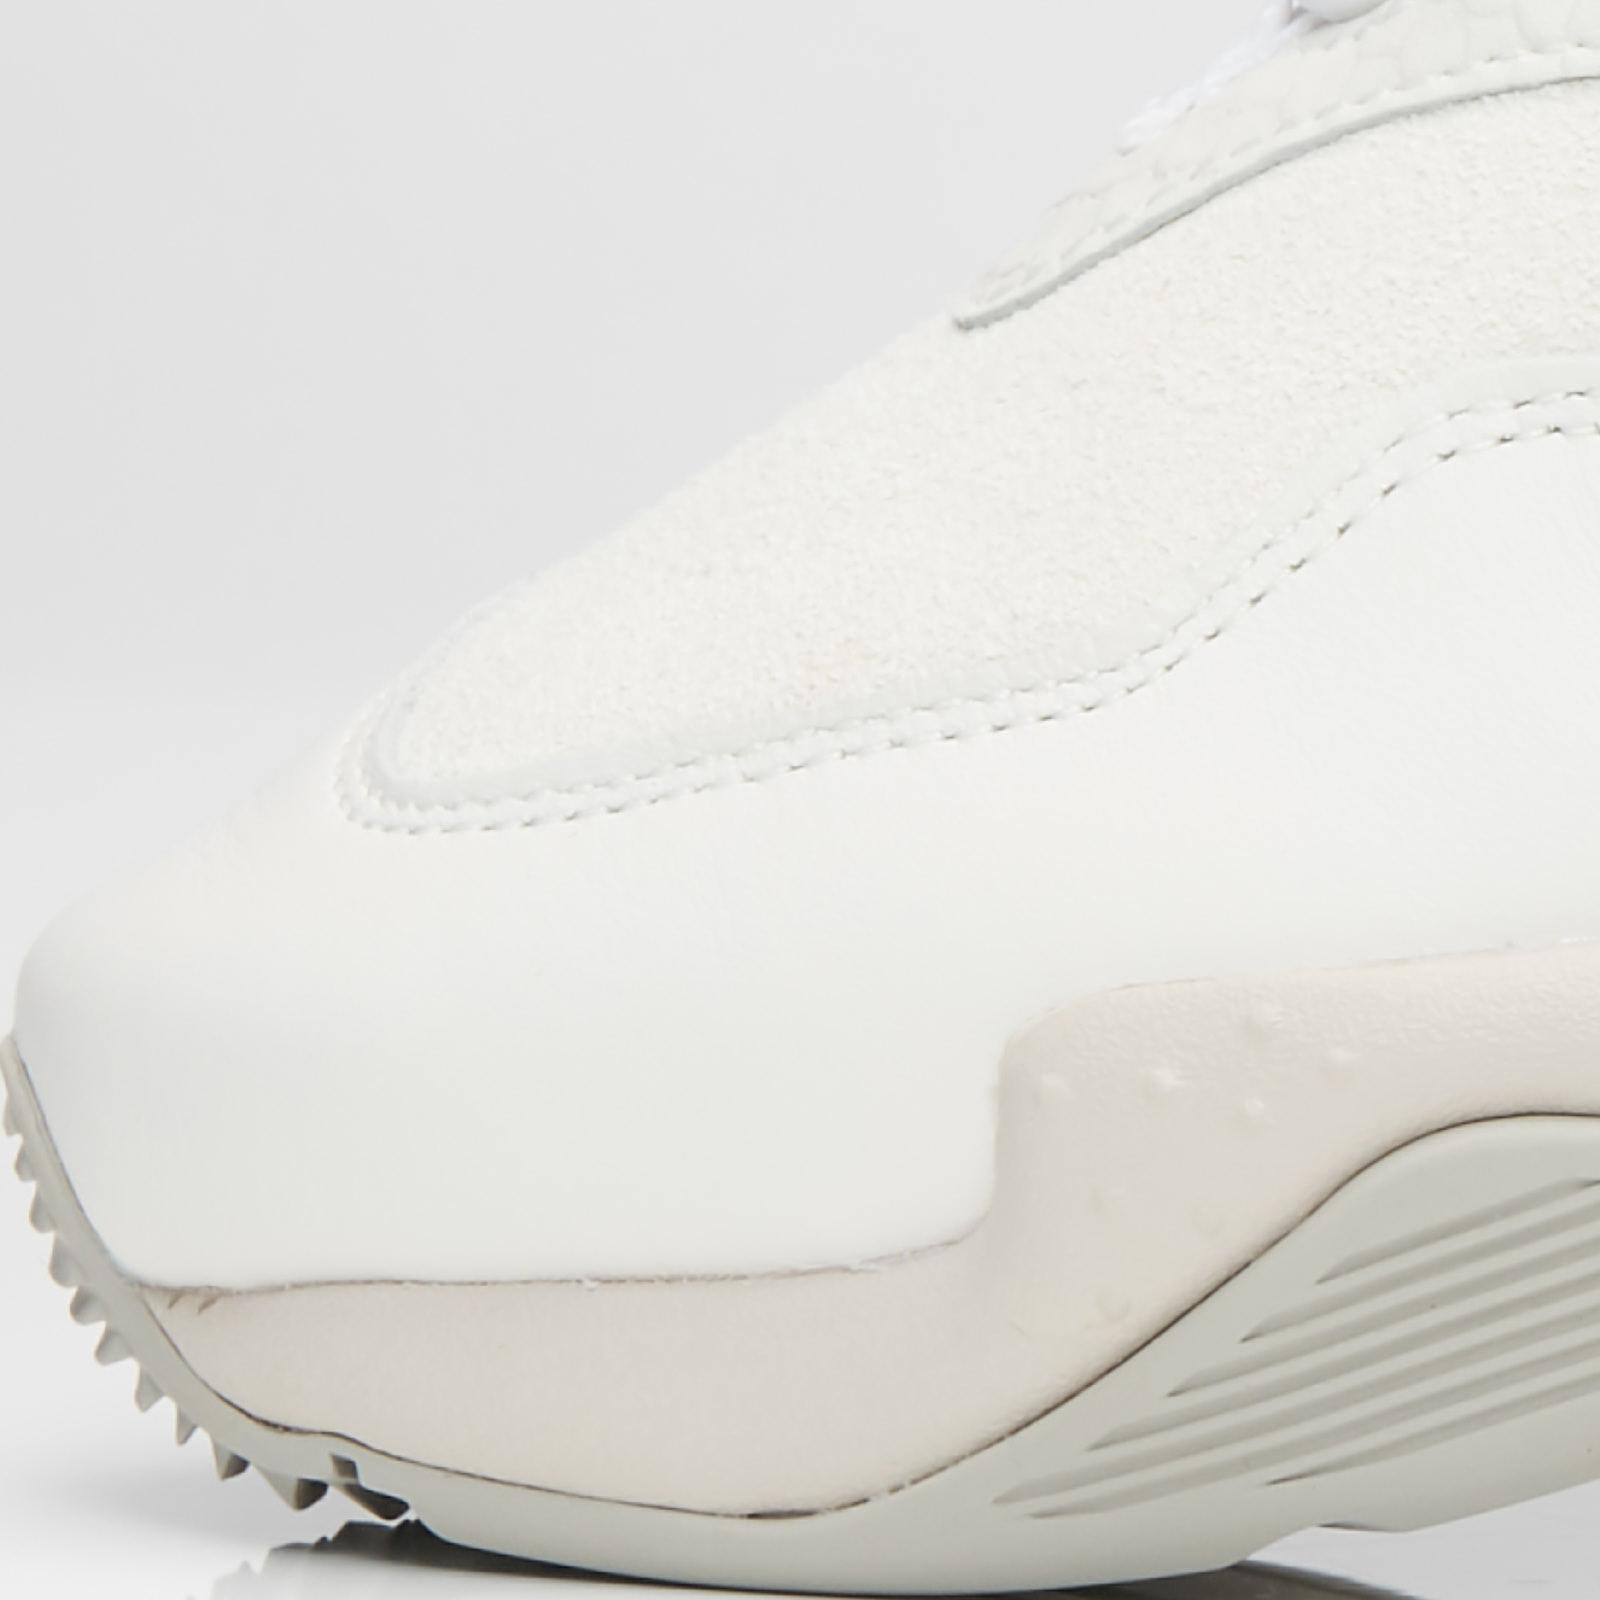 df508c2777bc Puma Thunder Desert - 367997-03 - Sneakersnstuff